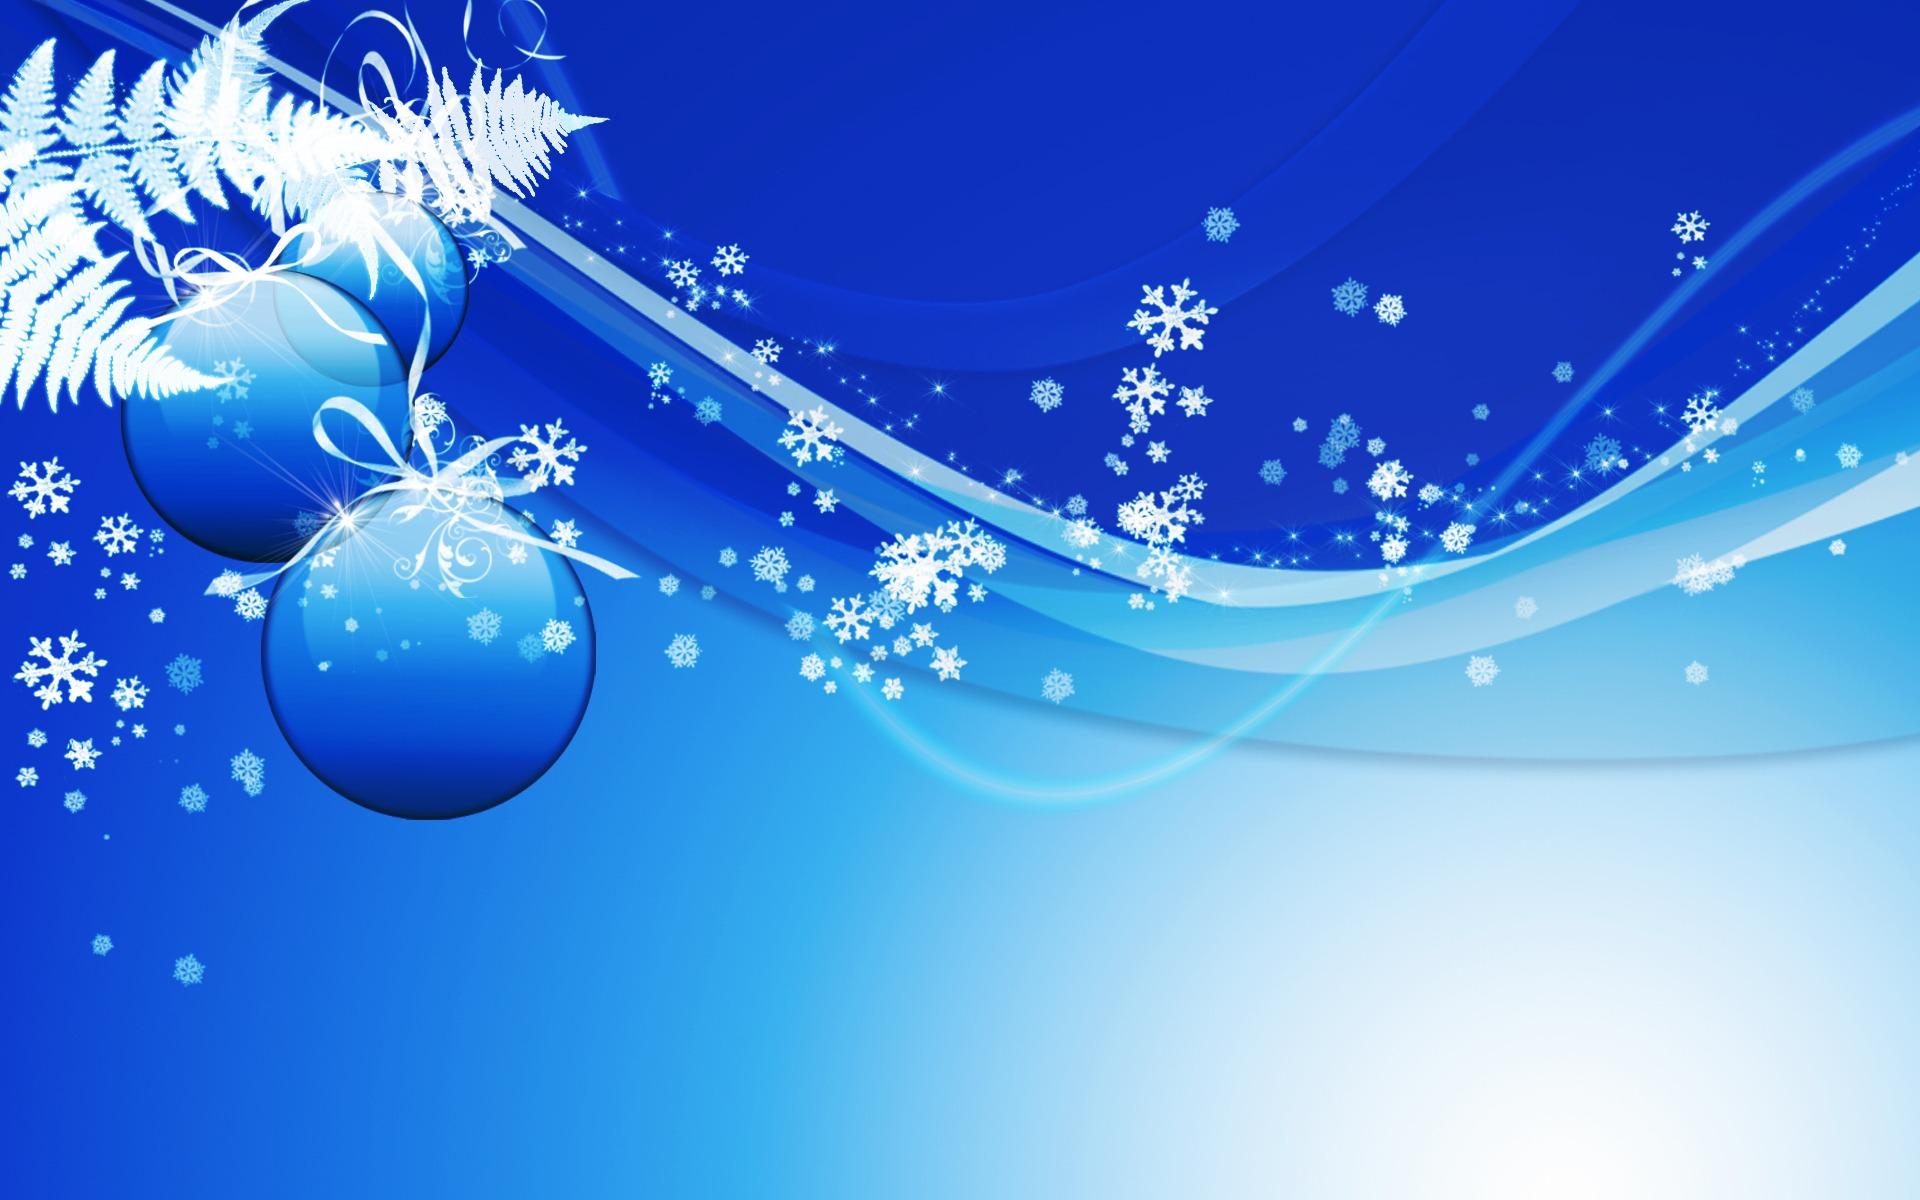 Go back to Christmas Wallpapers and Screensavers Next Image 1920x1200